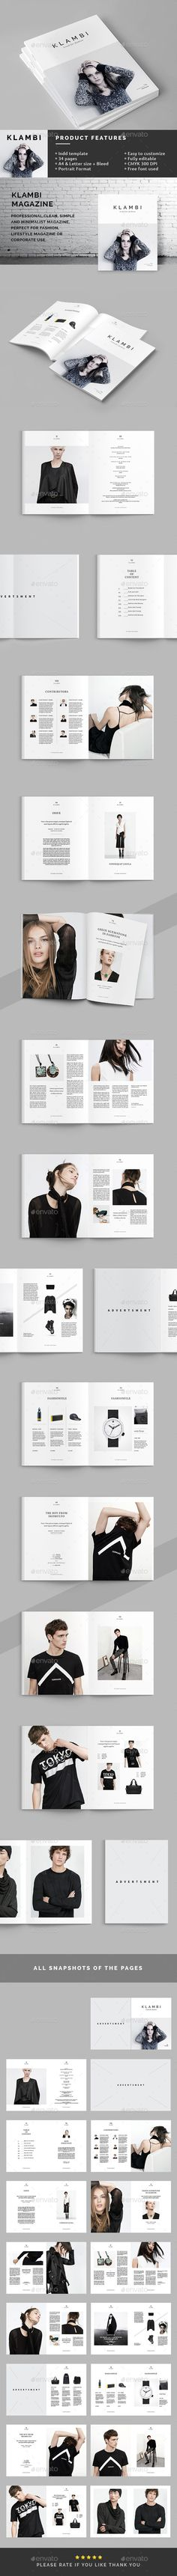 Klambi Magazine Template InDesign INDD #design #journal Download: http://graphicriver.net/item/klambi-magazine-/13303152?ref=ksioks